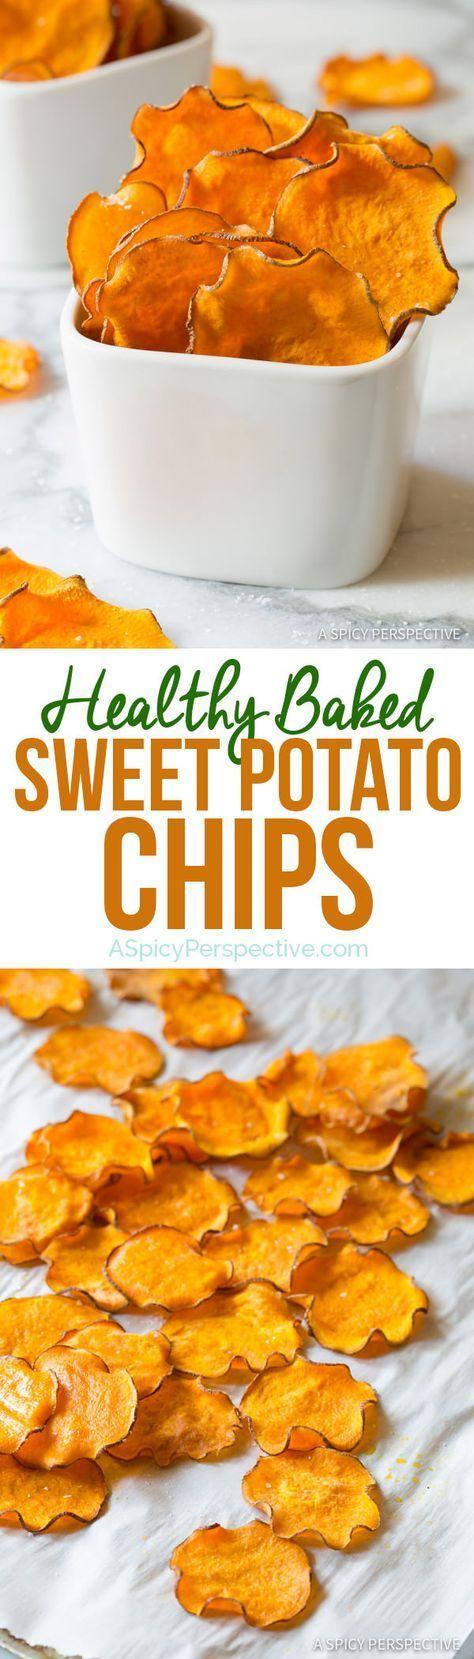 Healthy 3-Ingredient Baked Sweet Potato Chips Recipe (Vegan, Paleo & Gluten Free!) | ASpicyPerspective...